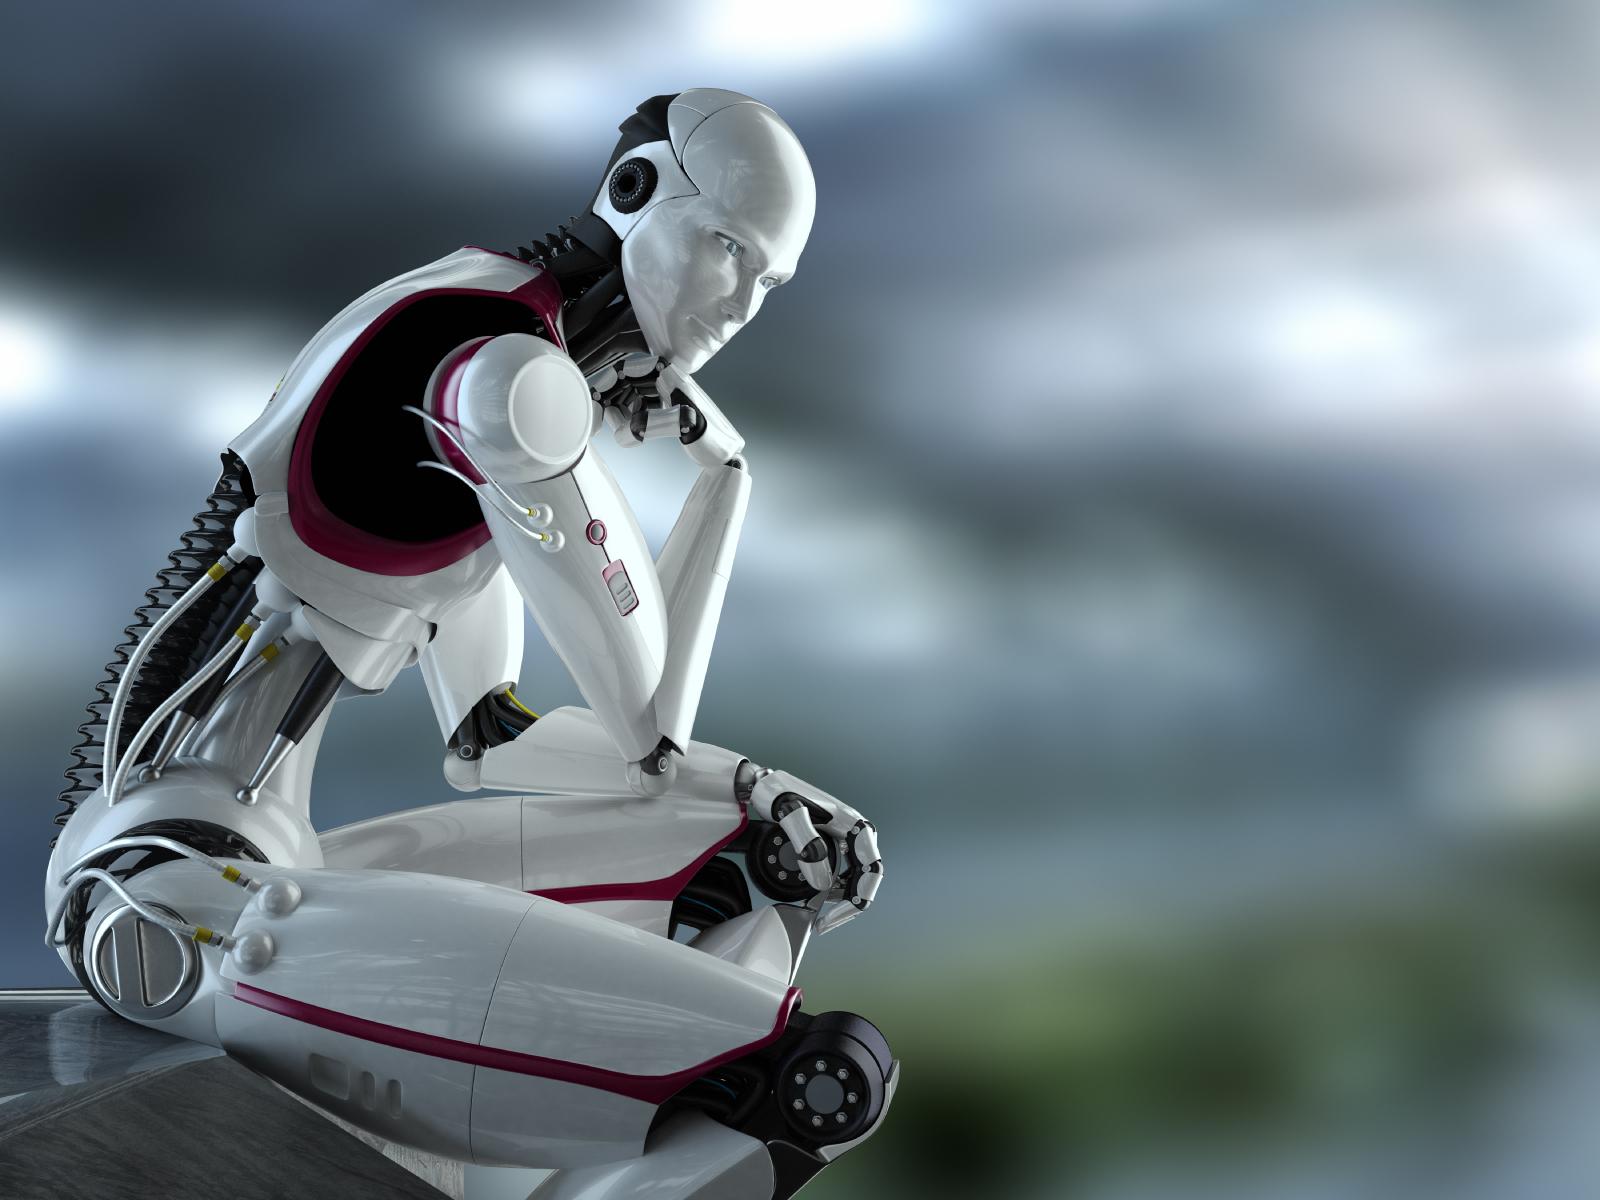 https://secureservercdn.net/198.71.233.72/0va.650.myftpupload.com/wp-content/uploads/2016/02/robot-artificial-intelligence.jpg